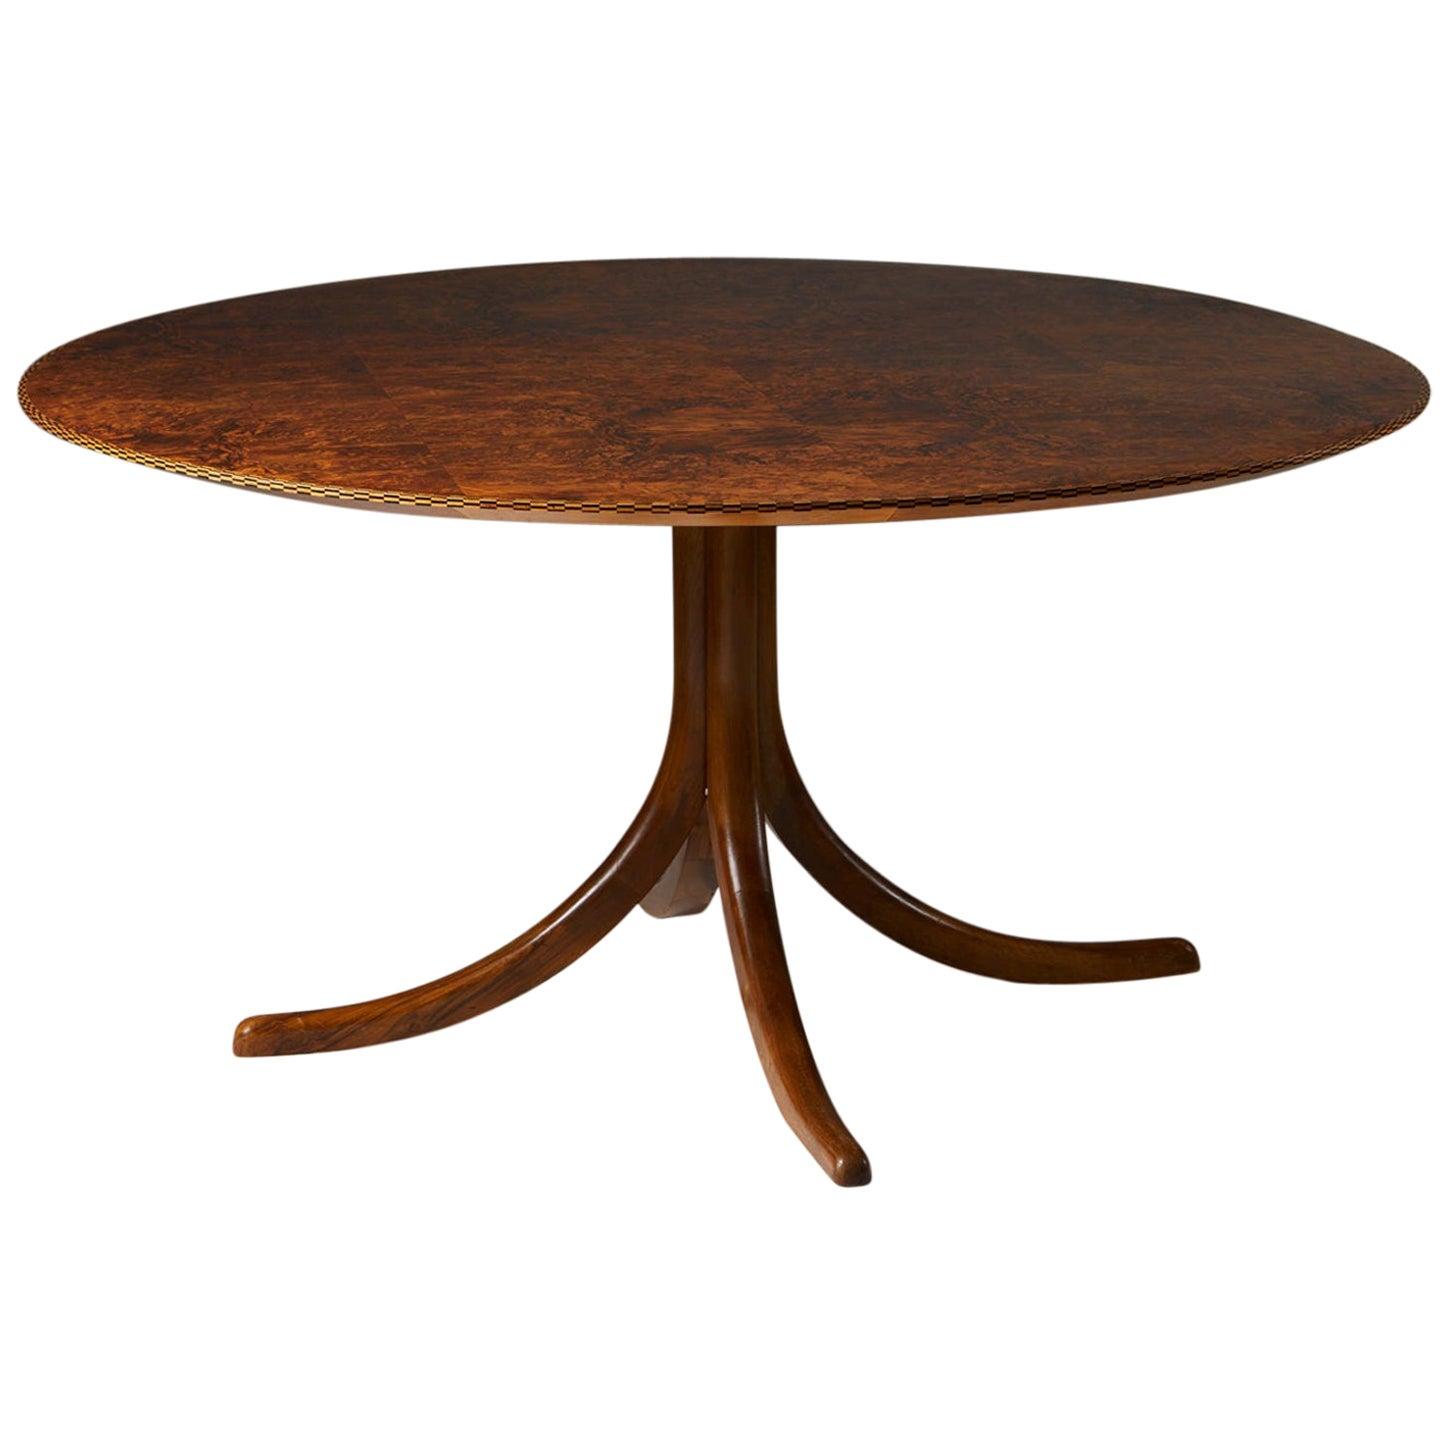 Table Model 1020 Designed by Josef Frank for Svenskt Tenn, Sweden, 1940s